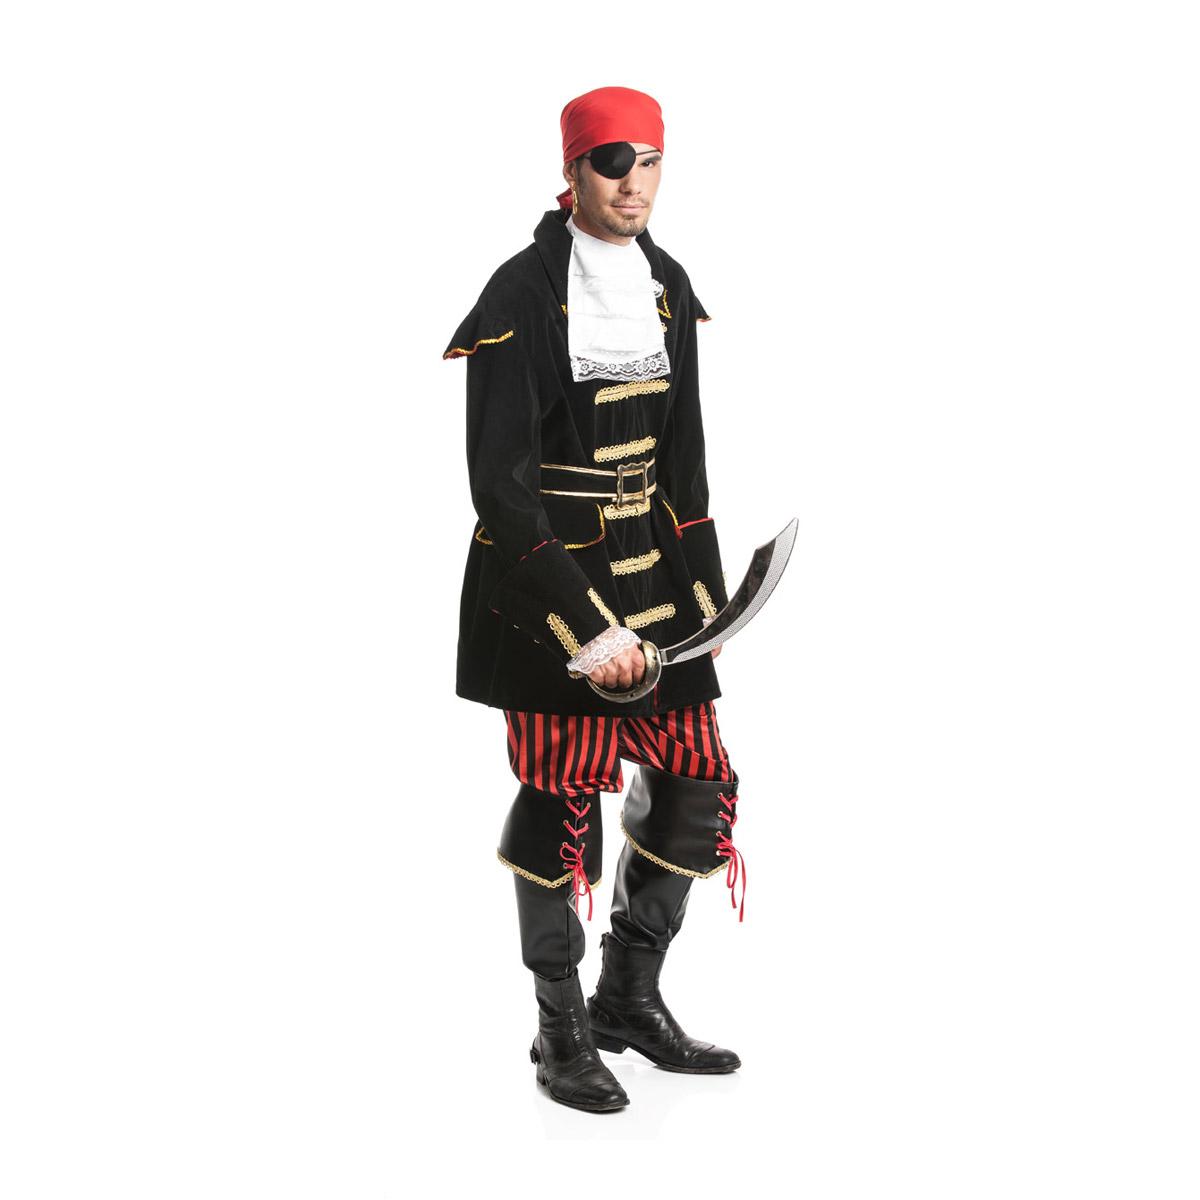 piraten kost m herren 6 teilig komplett mit stulpen kost mplanet. Black Bedroom Furniture Sets. Home Design Ideas